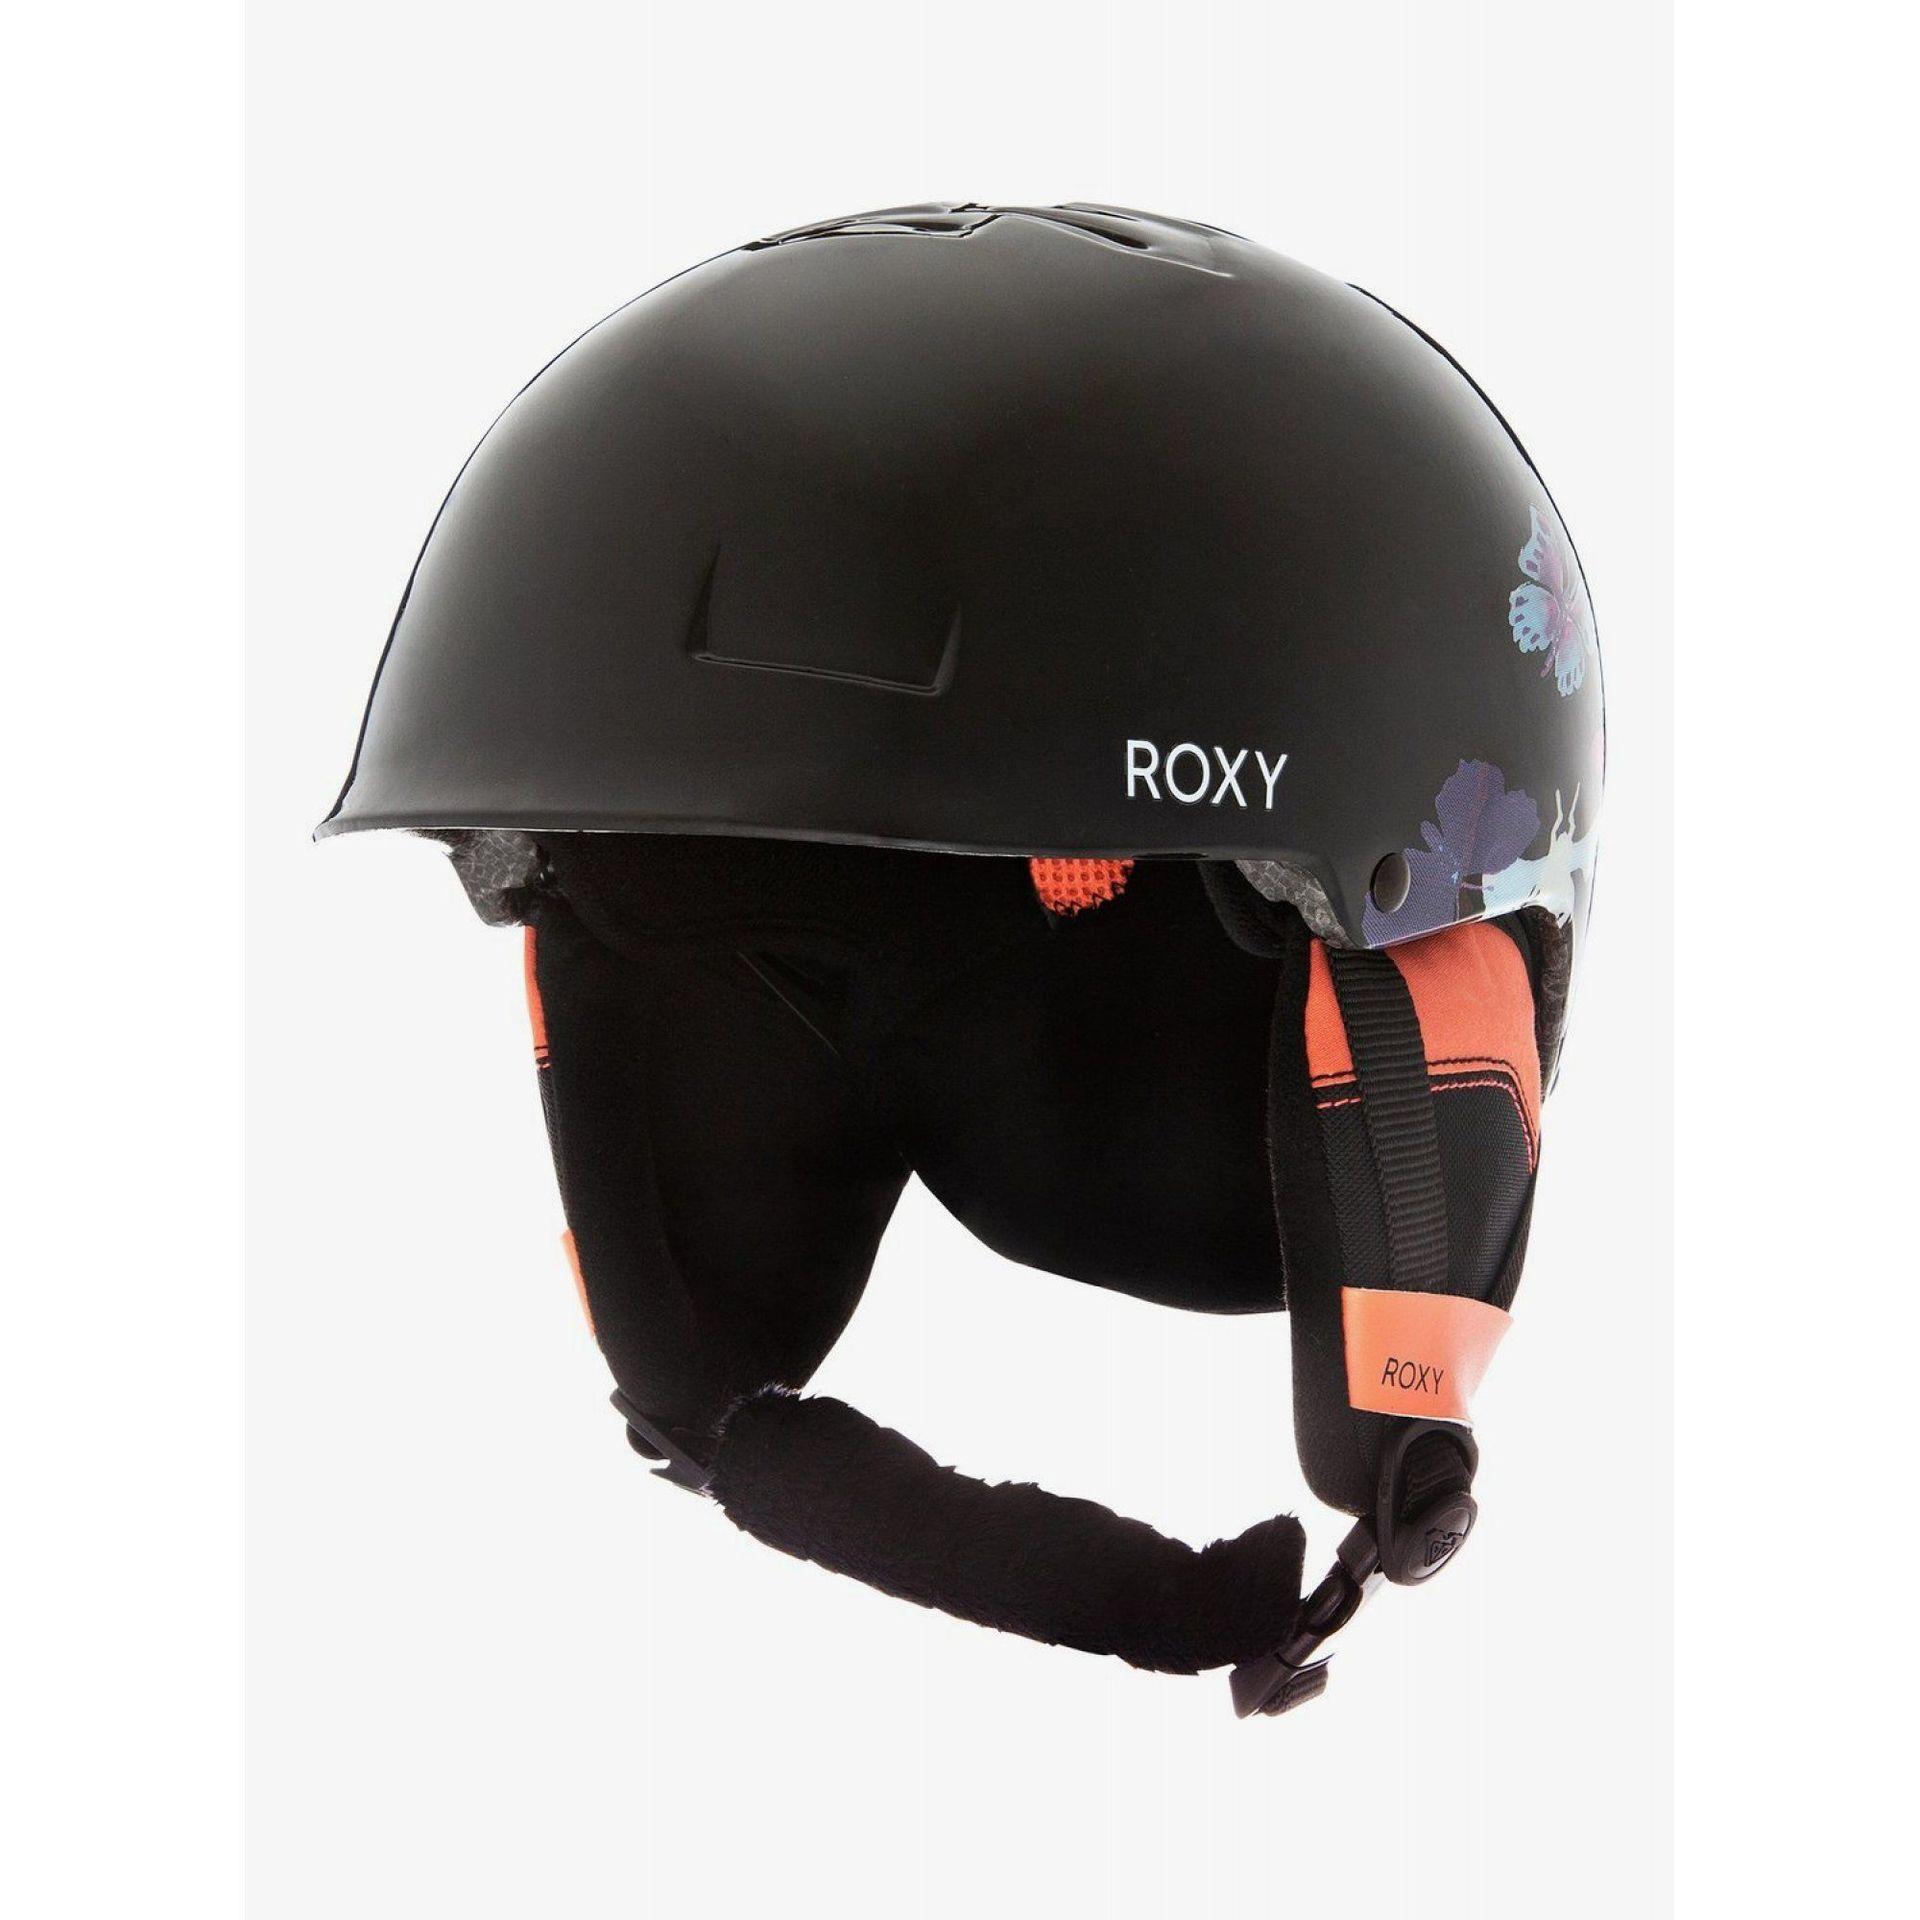 KASK ROXY HAPPYLAND ERGTL03016-BTE6 ARCTIC LEAVES 1